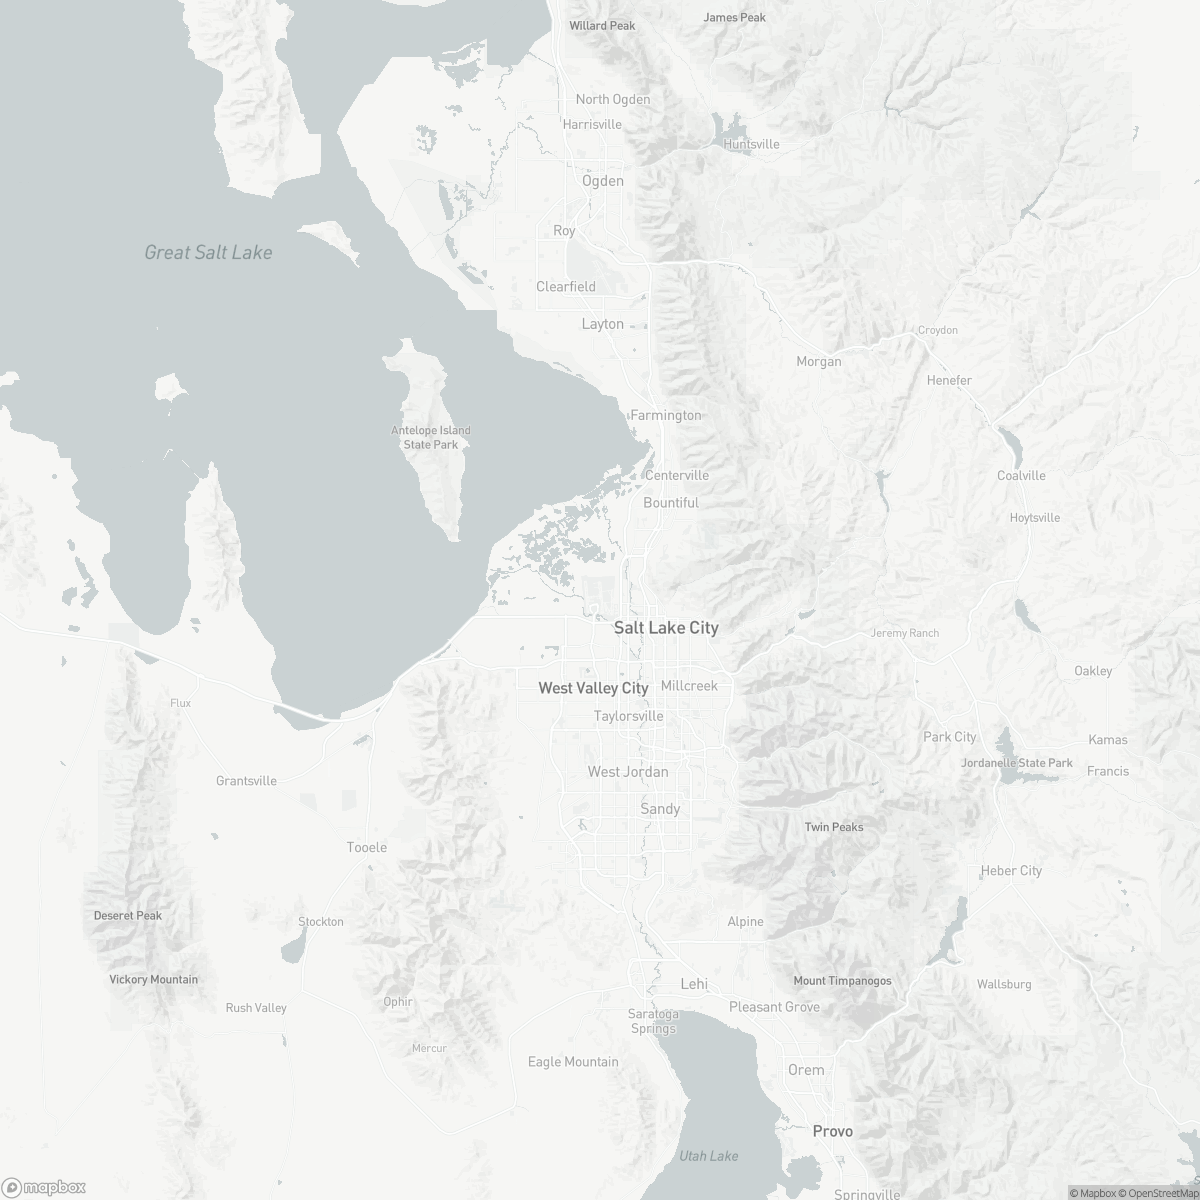 Map of Salt Lake City Int. SLC surrounding area of Salt Lake City Utah